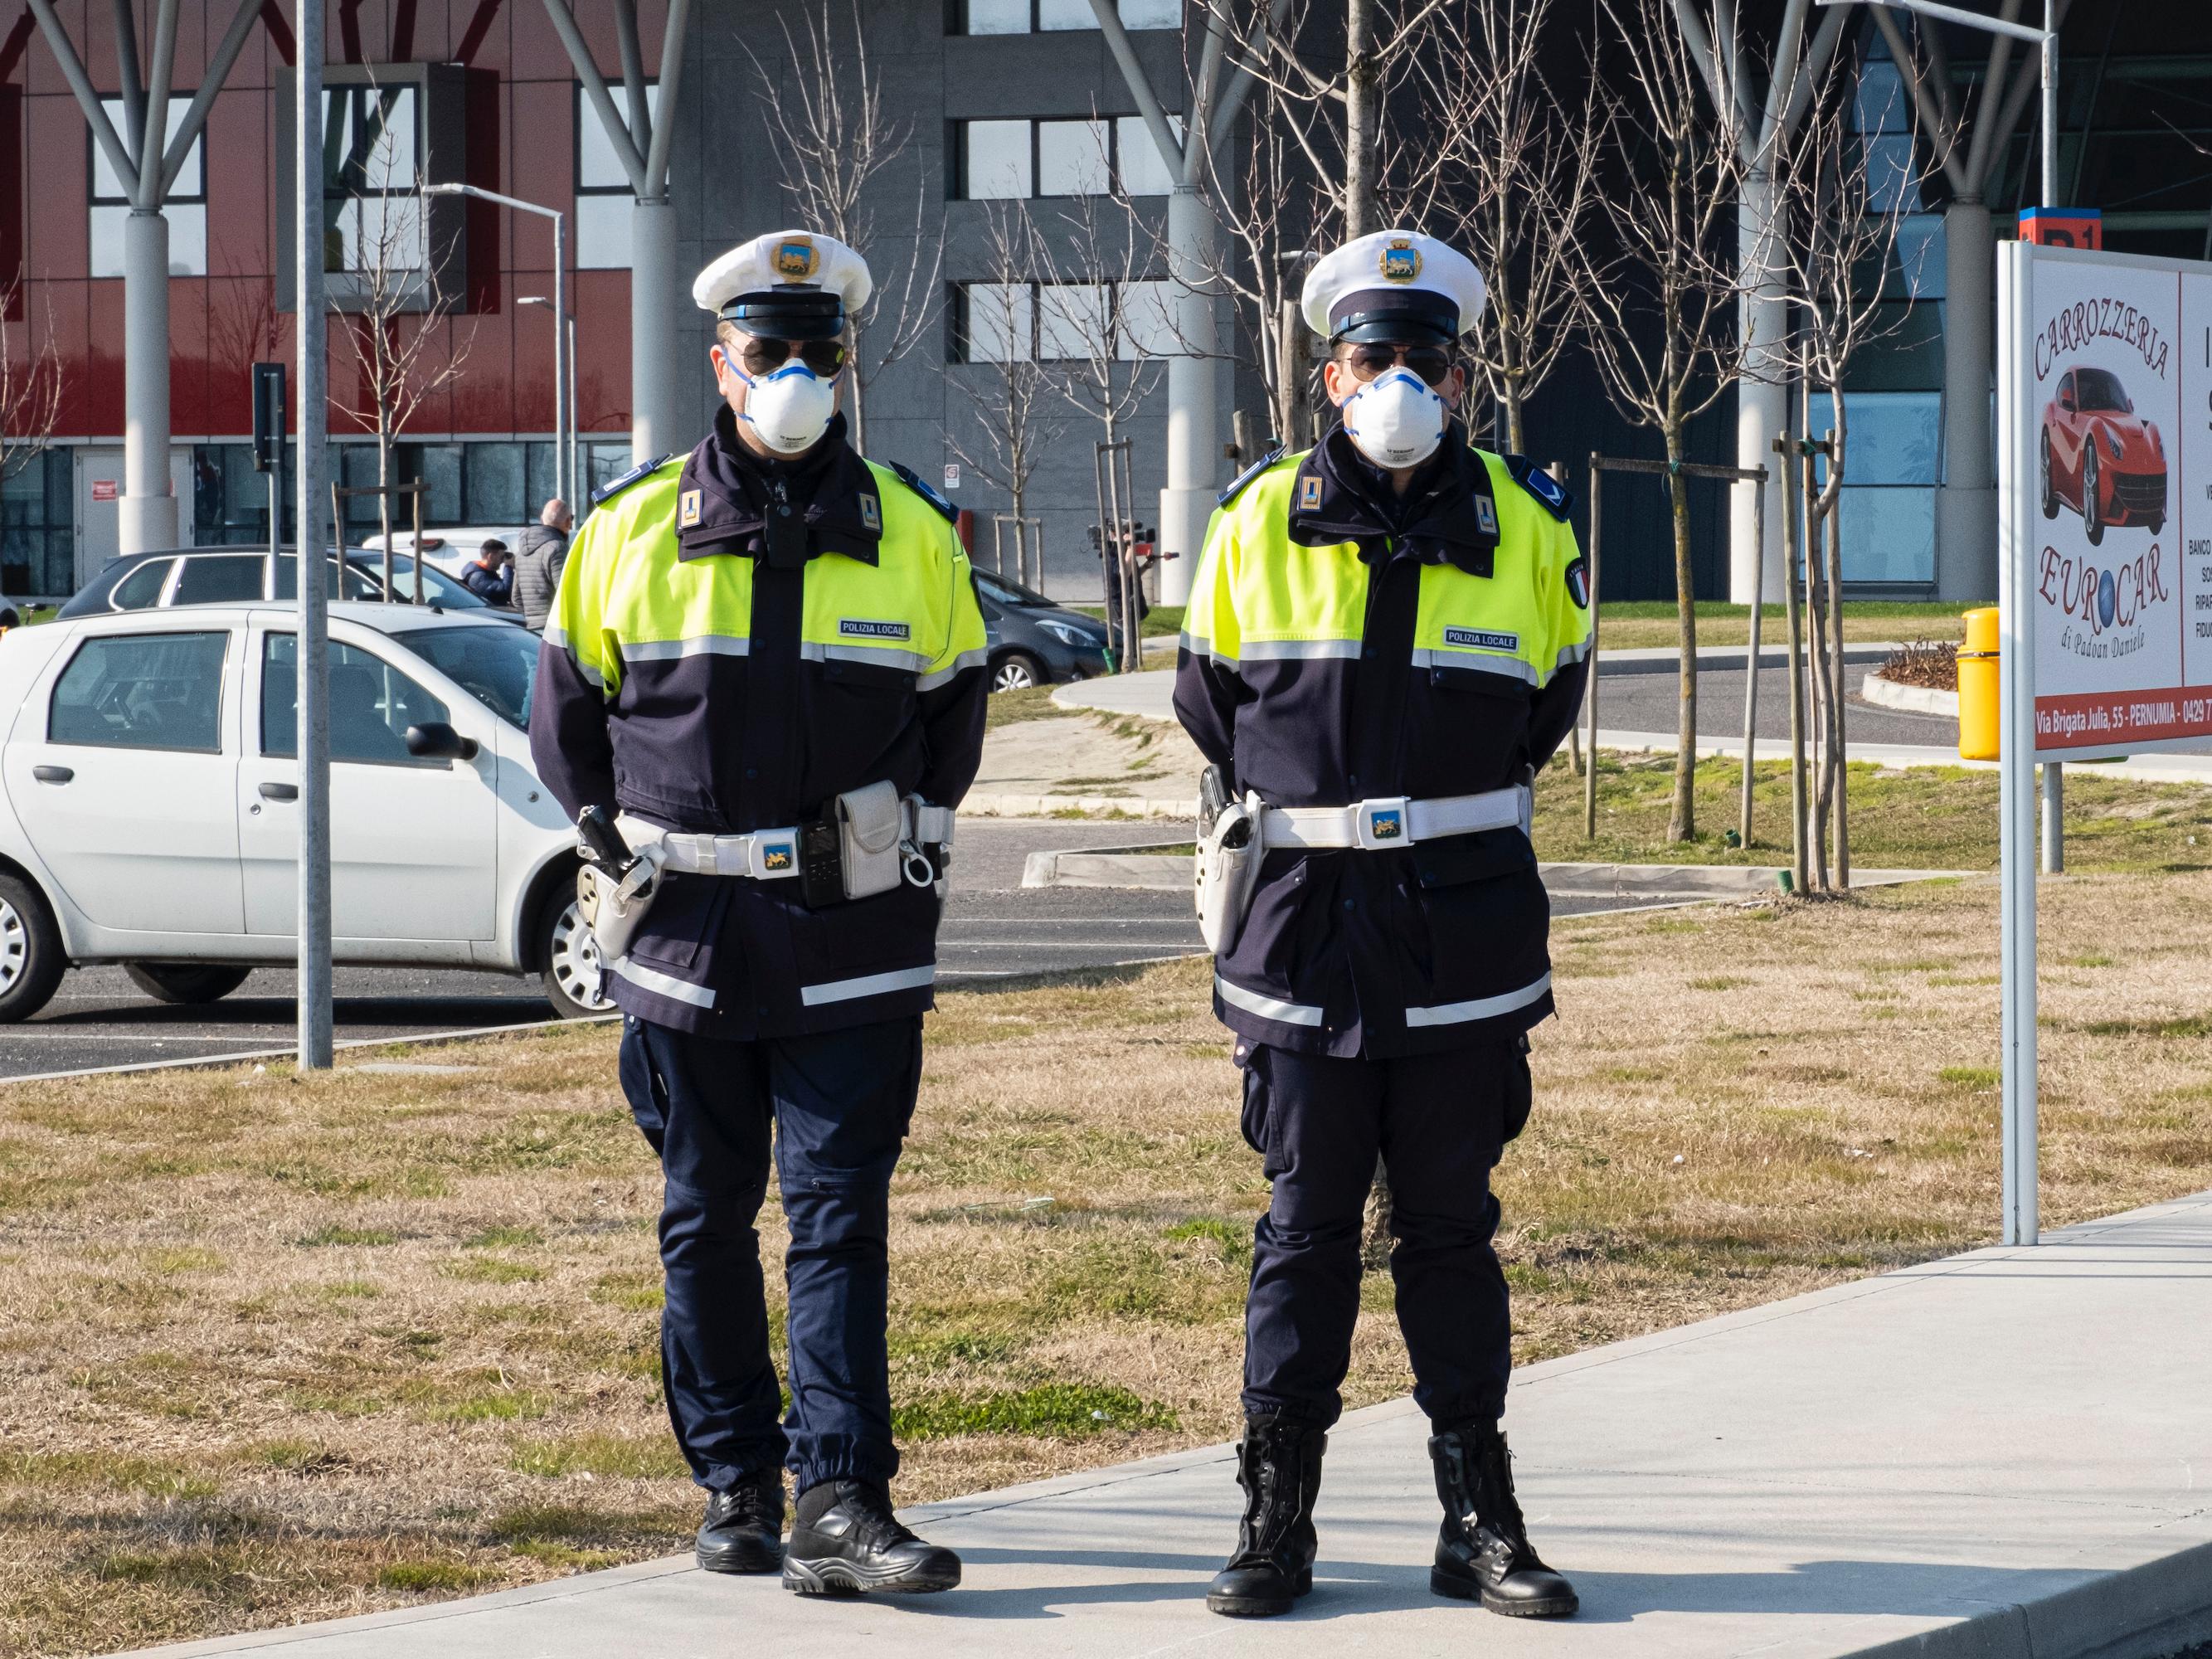 Italy has quarantined a dozen cities over coronavirus